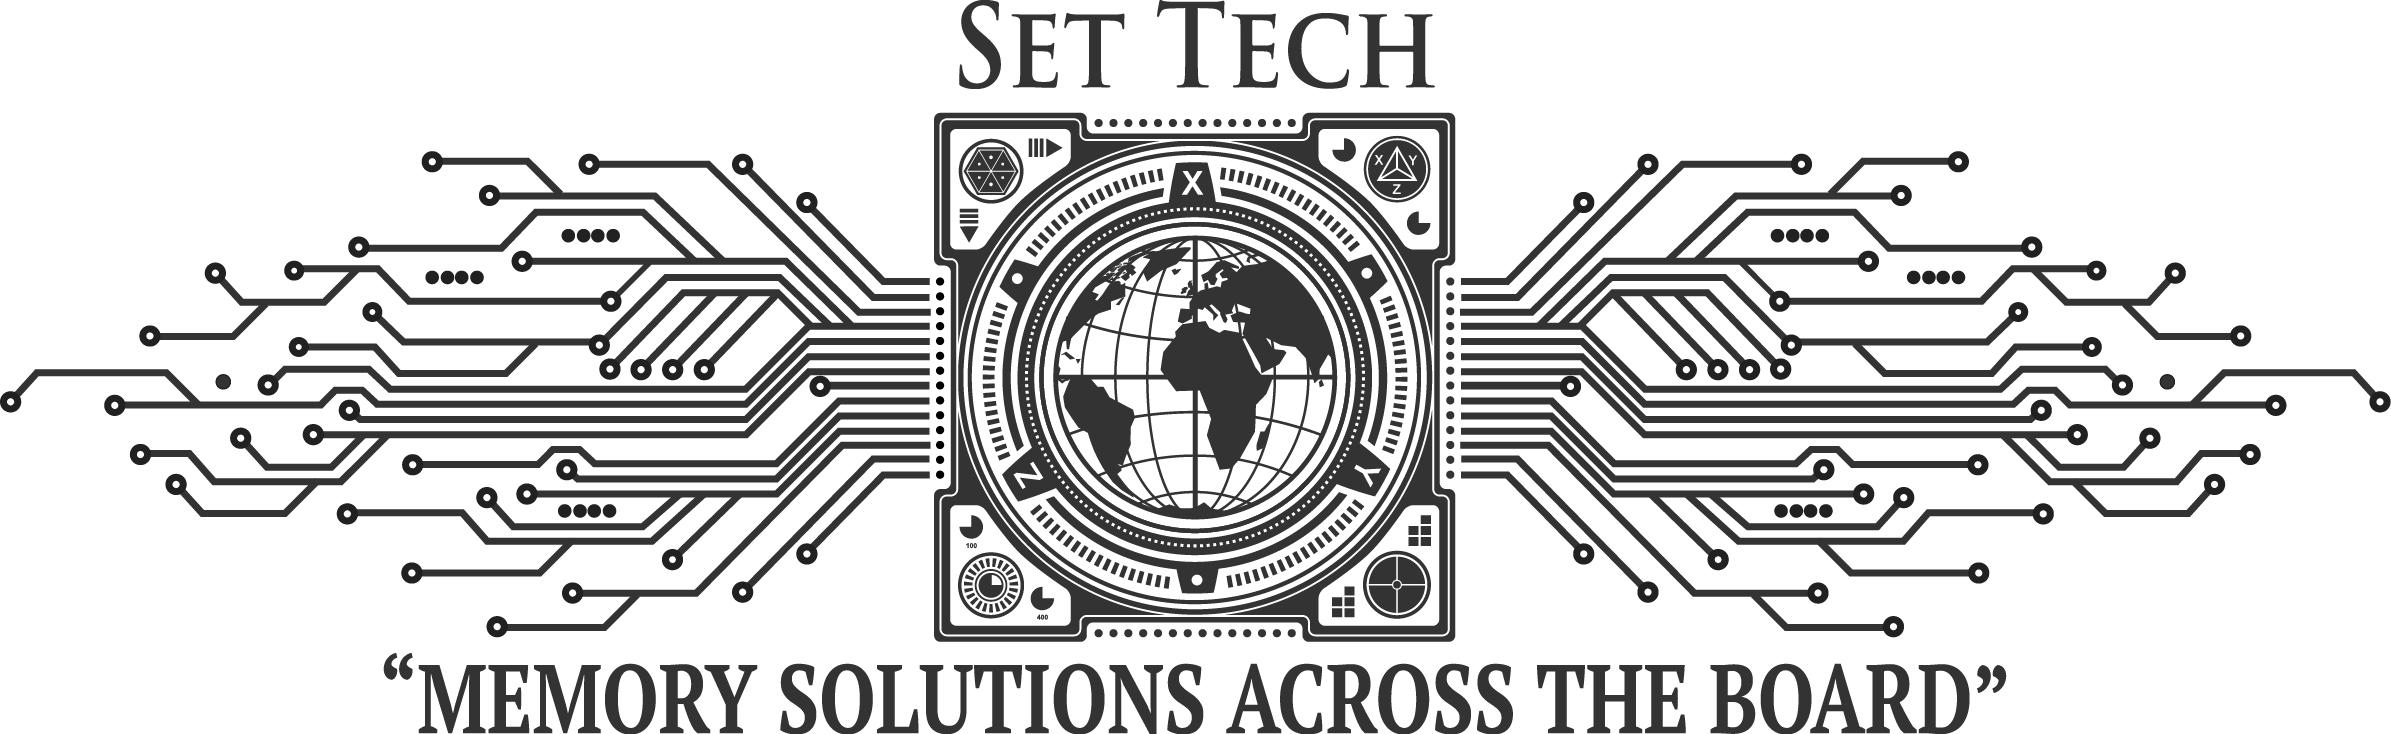 Set Tech: Memory Solutions Across The Board...